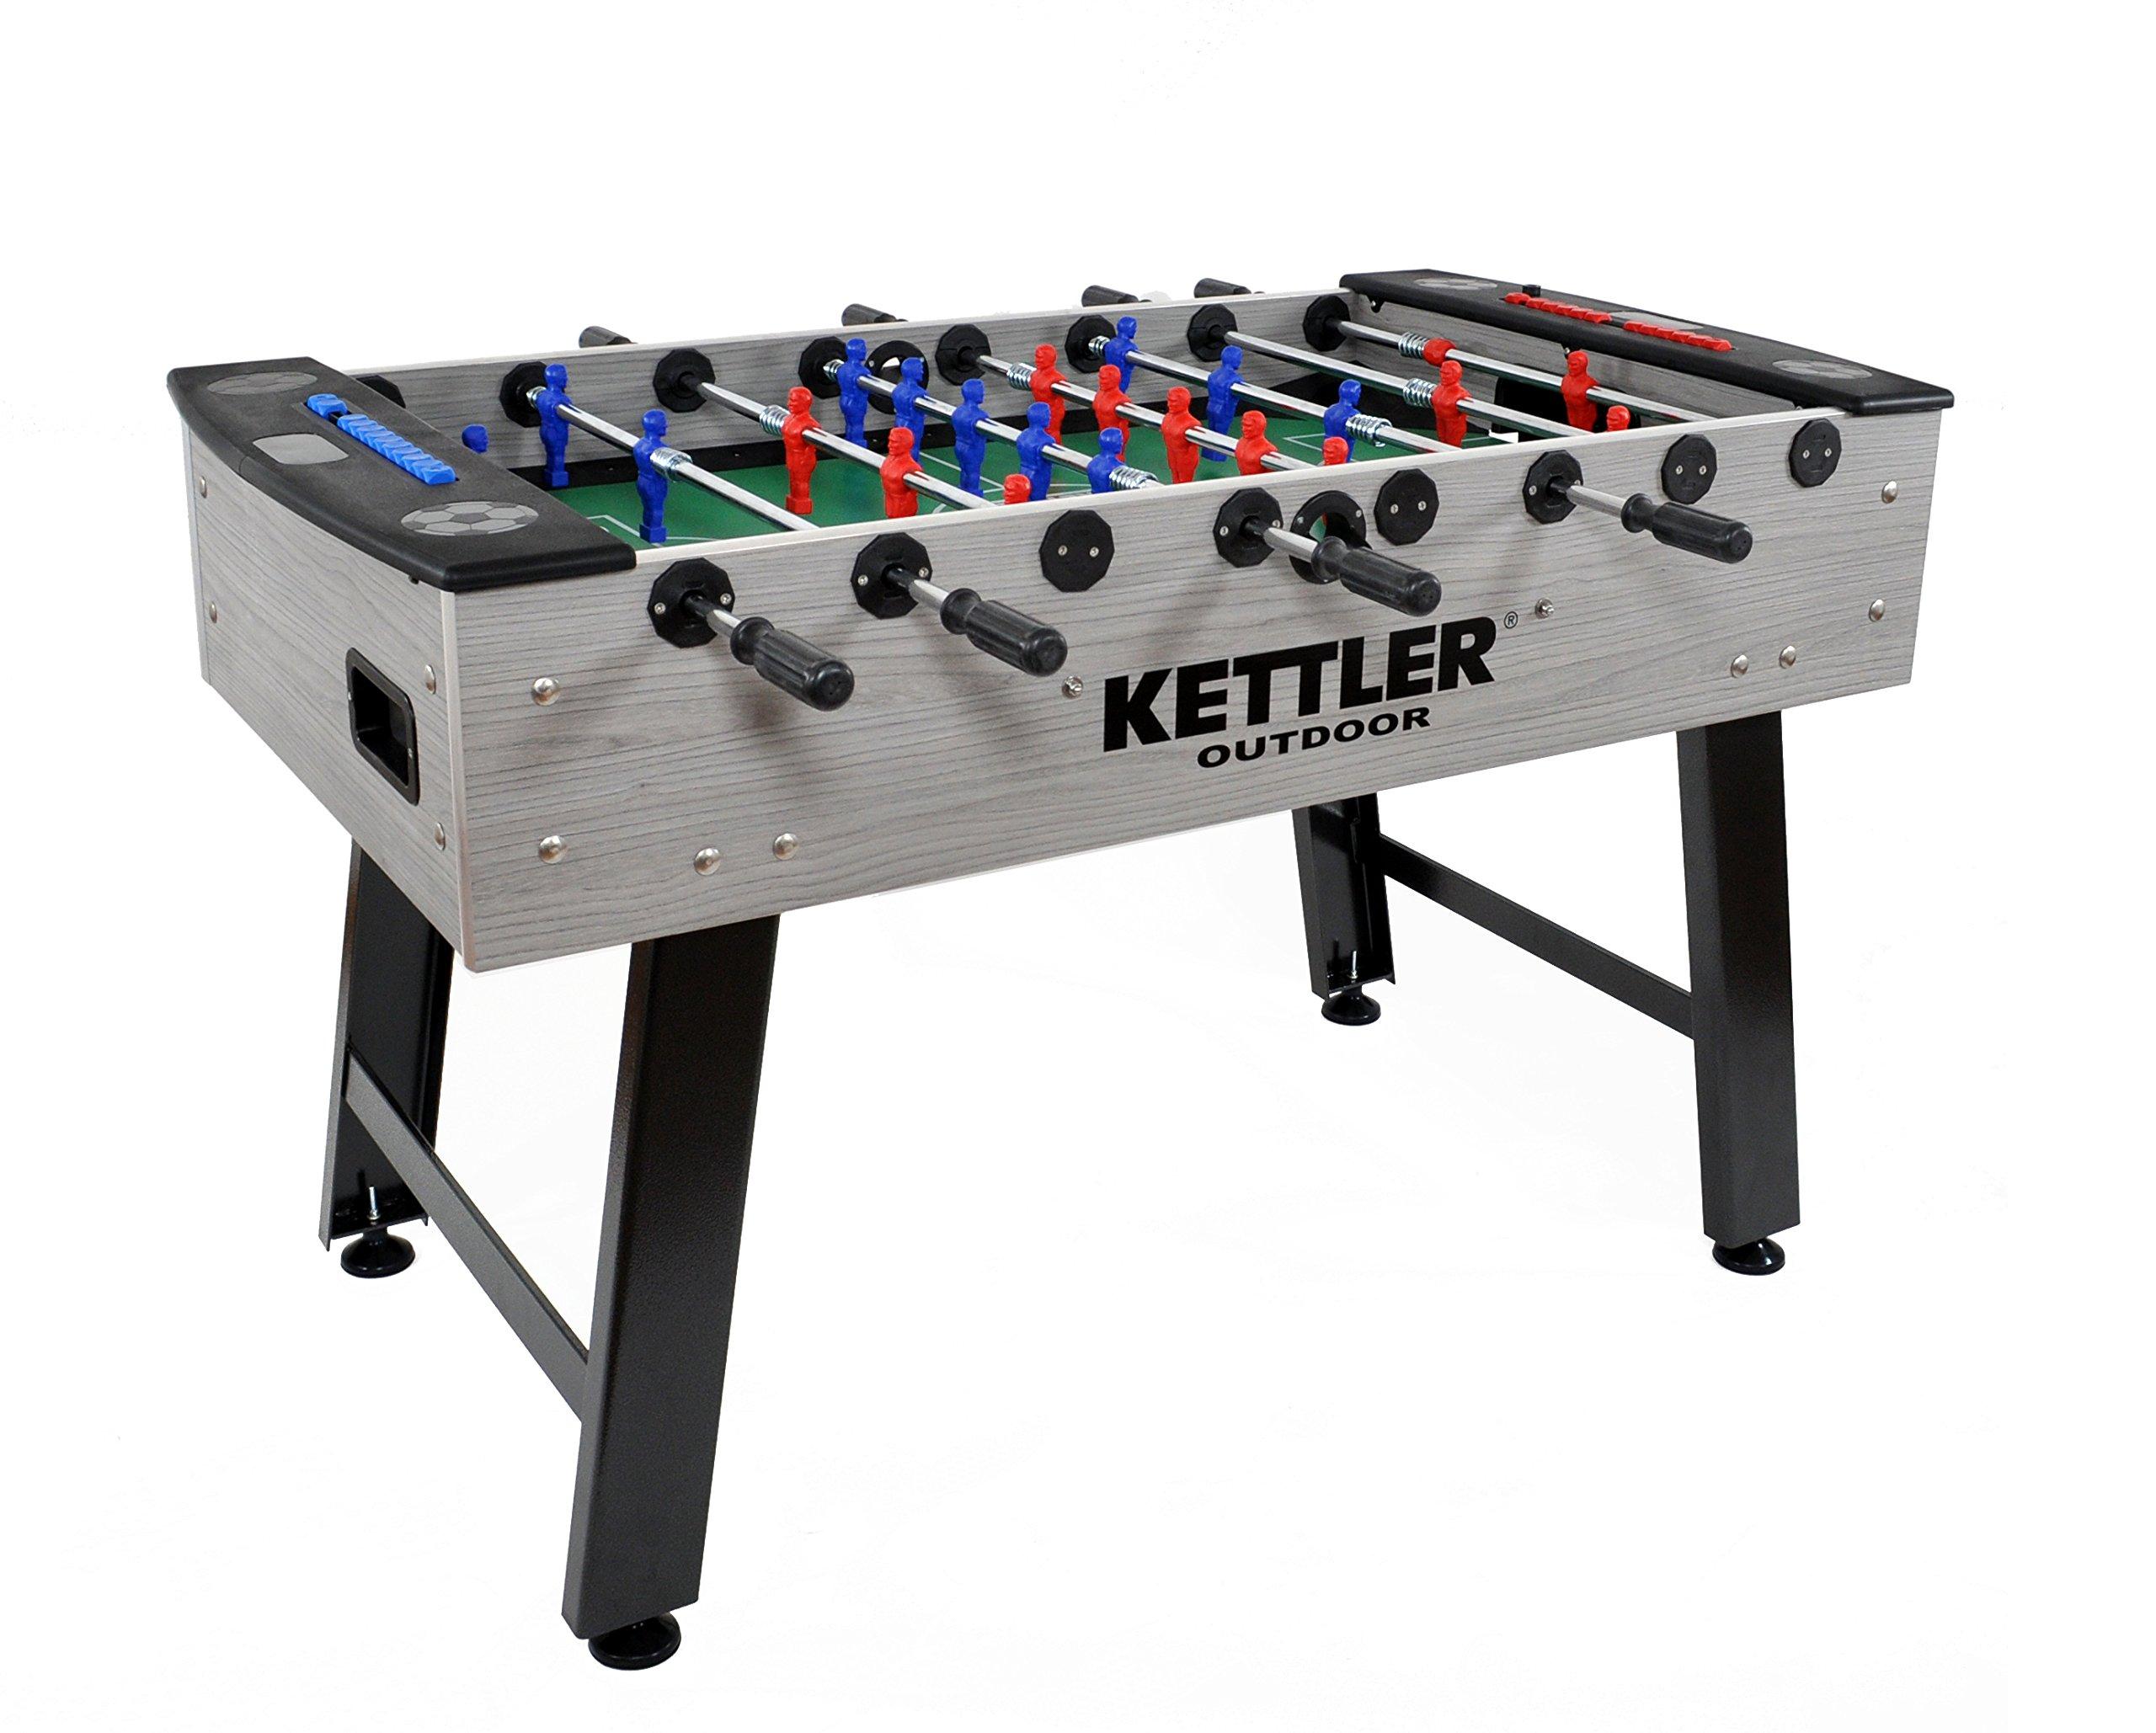 KETTLER Montecristo Outdoor Foosball Table by Kettler